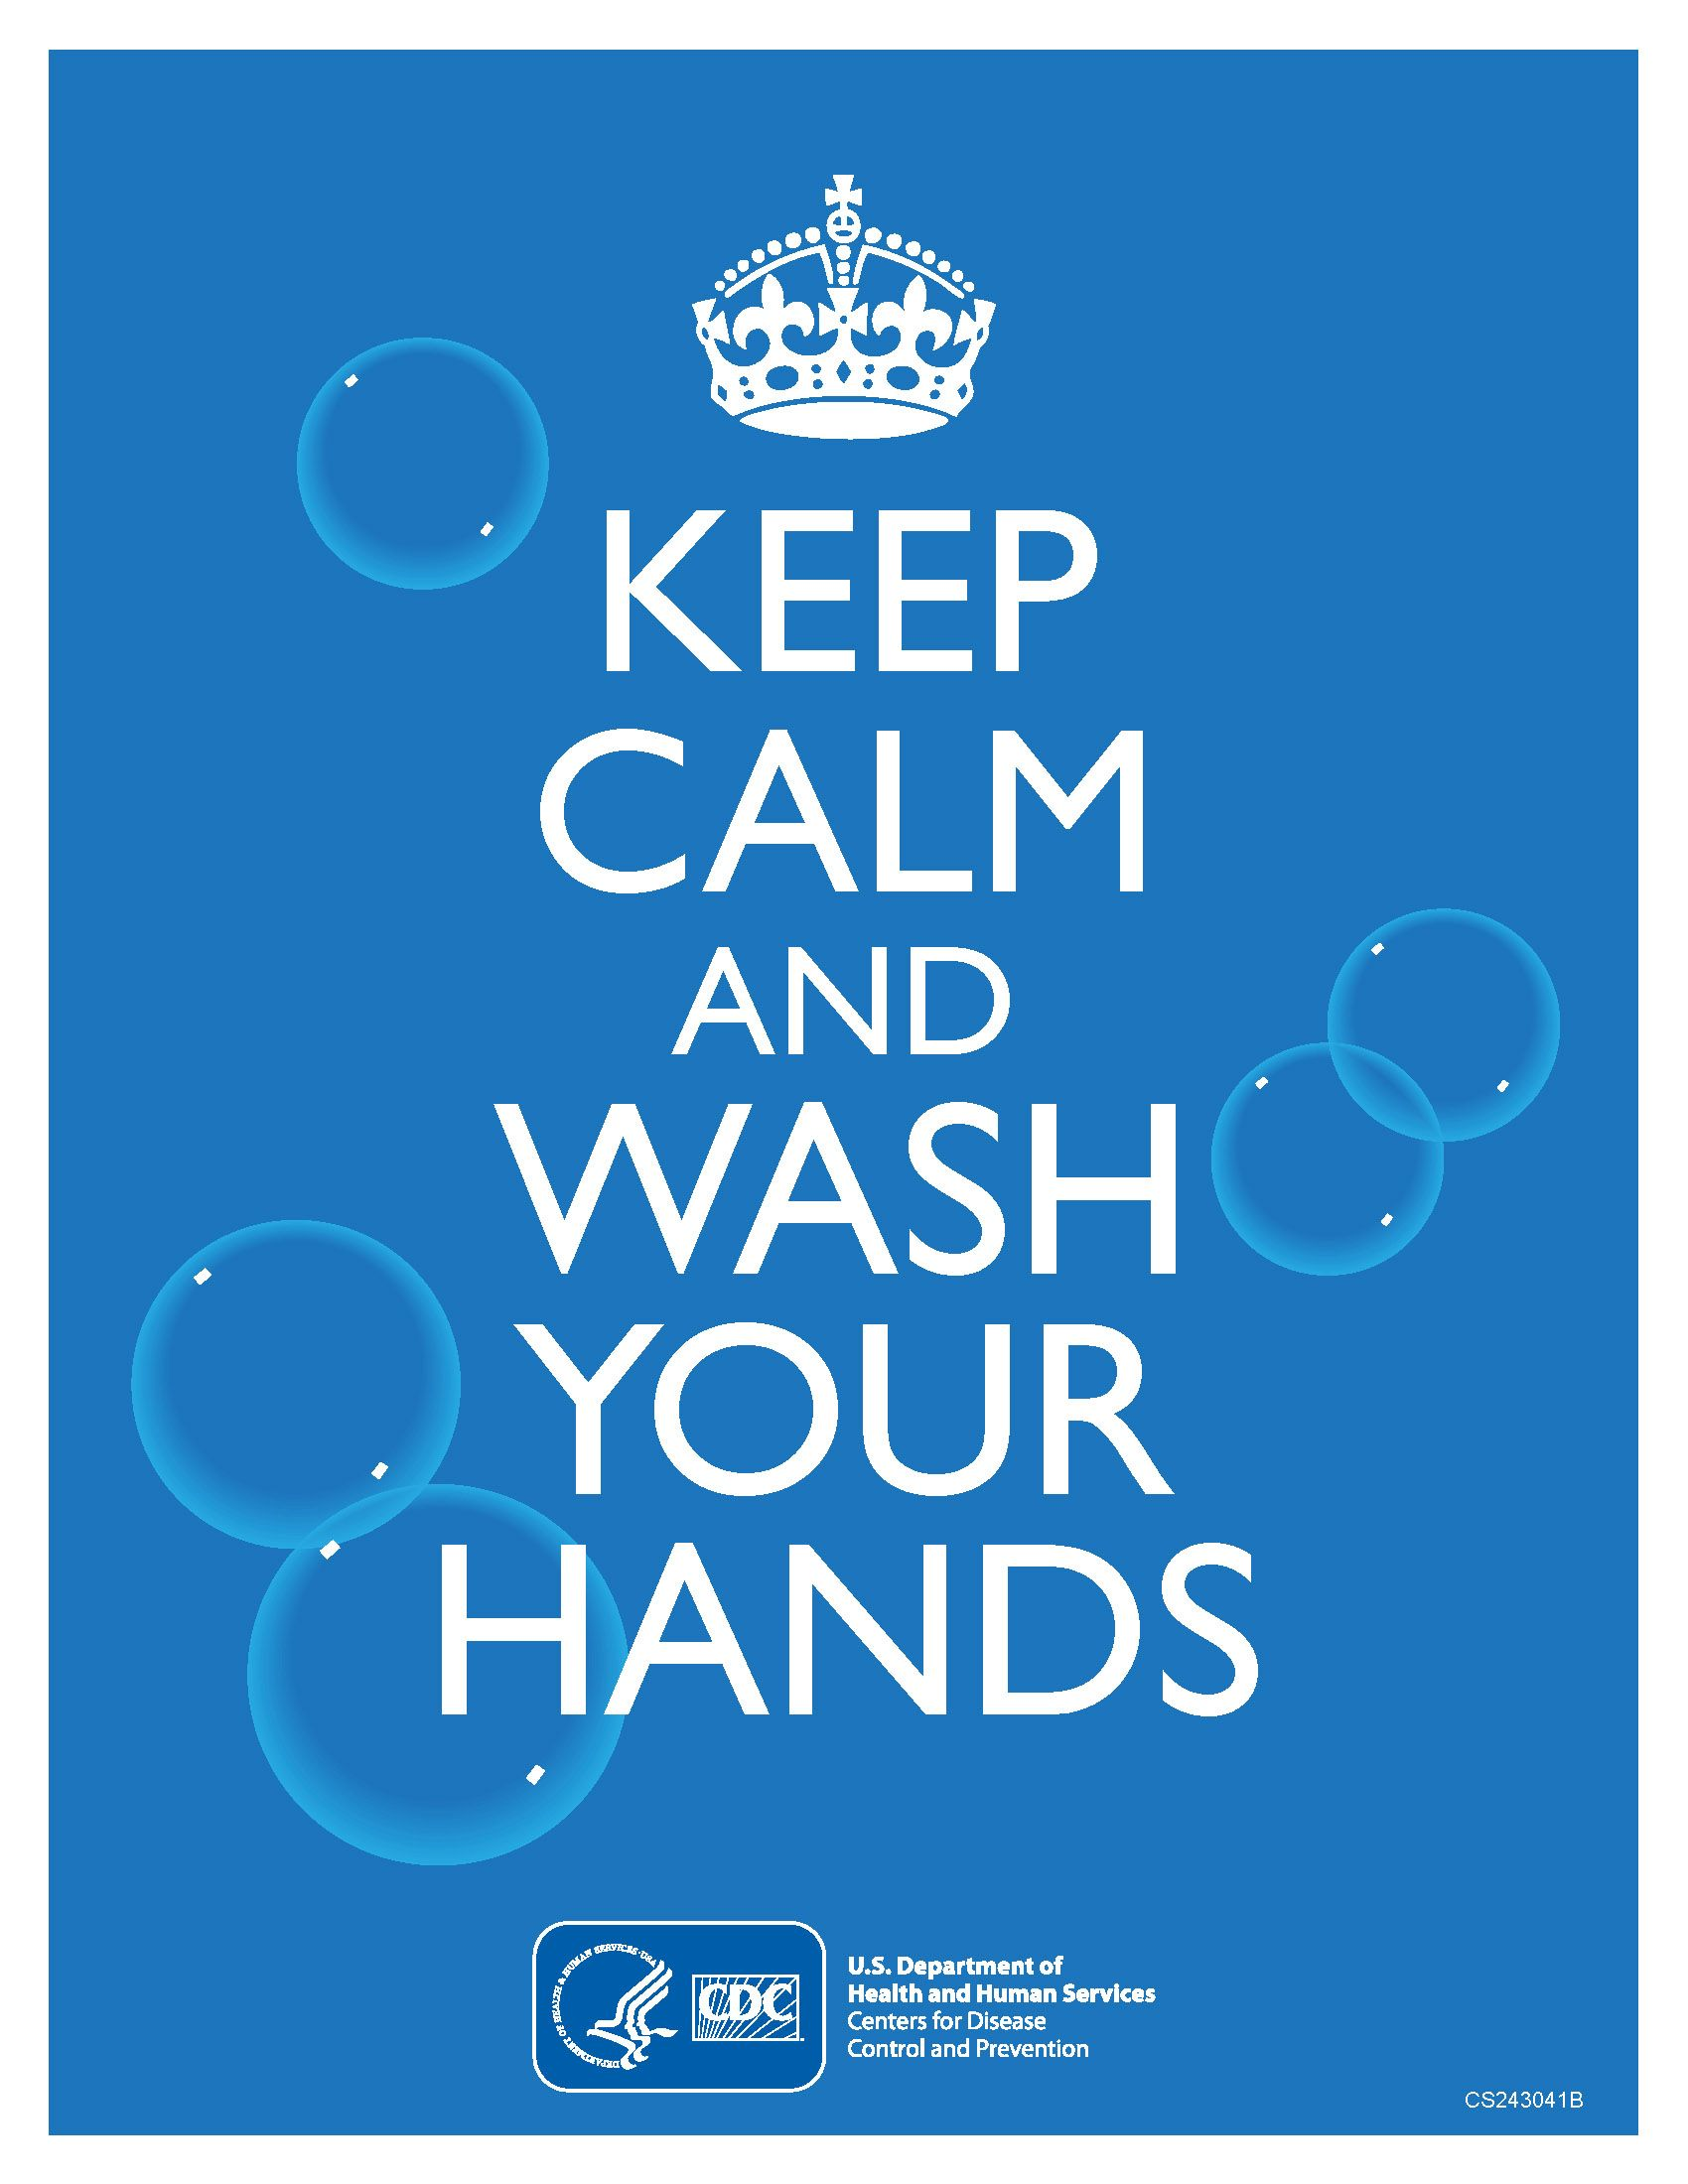 Keep Calm & Wash Your Hands Poster Coronavirus Disease